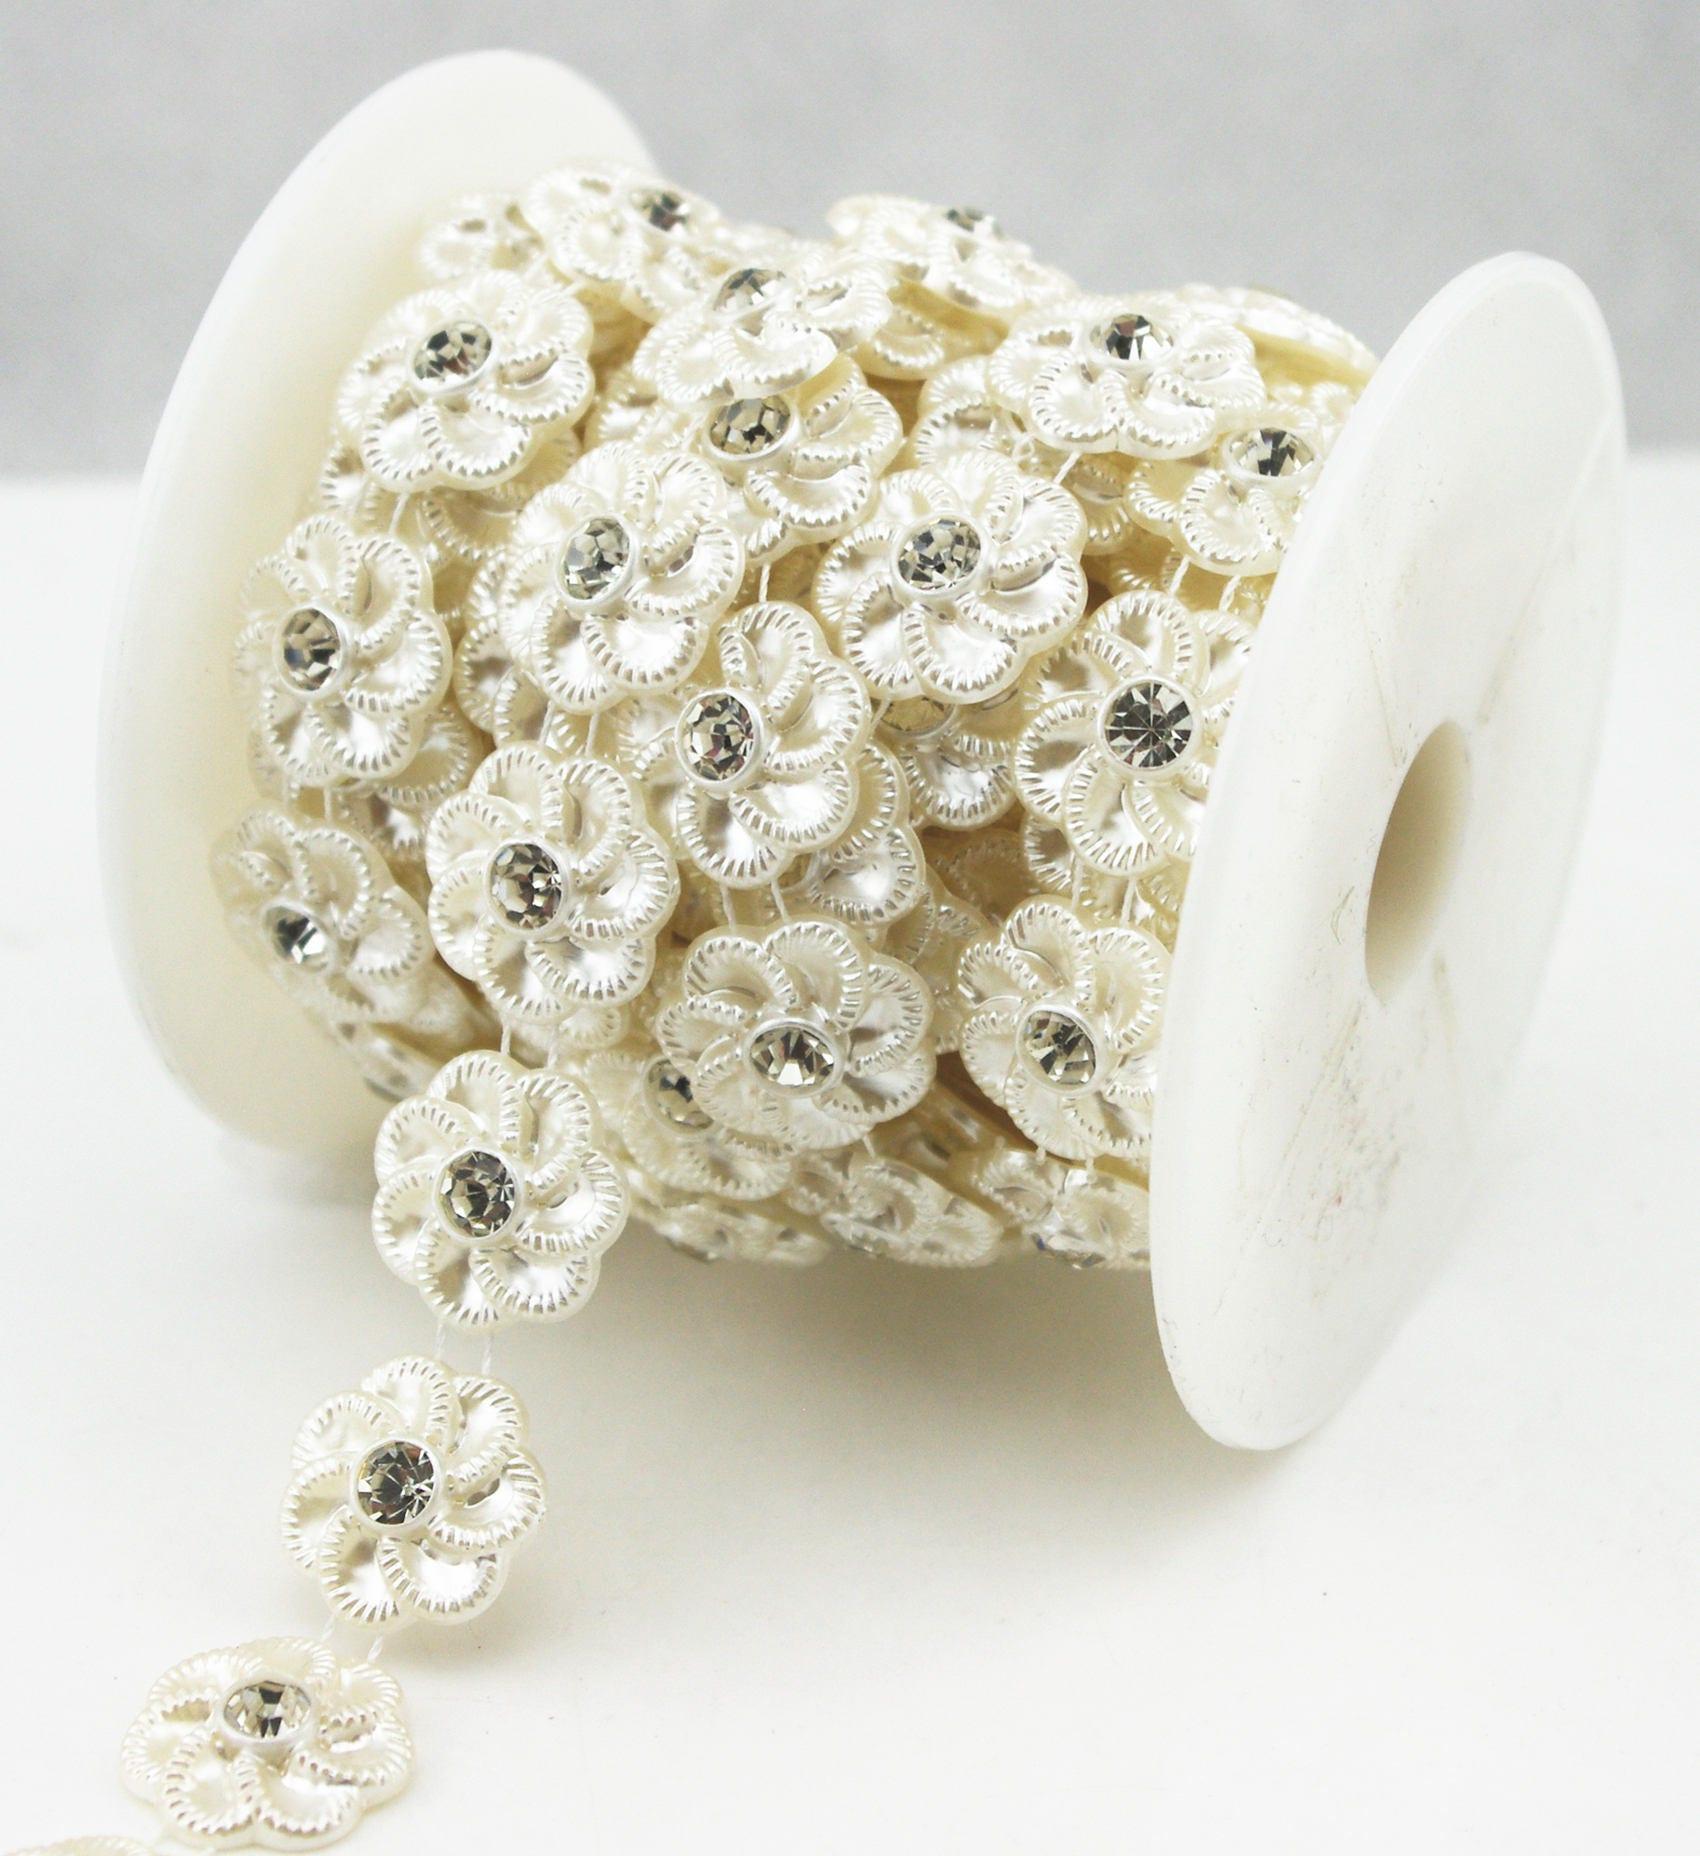 20mm Ivory Flower Pearl Rhinestone Chain Sewing Trims Cake  31c01ec95877